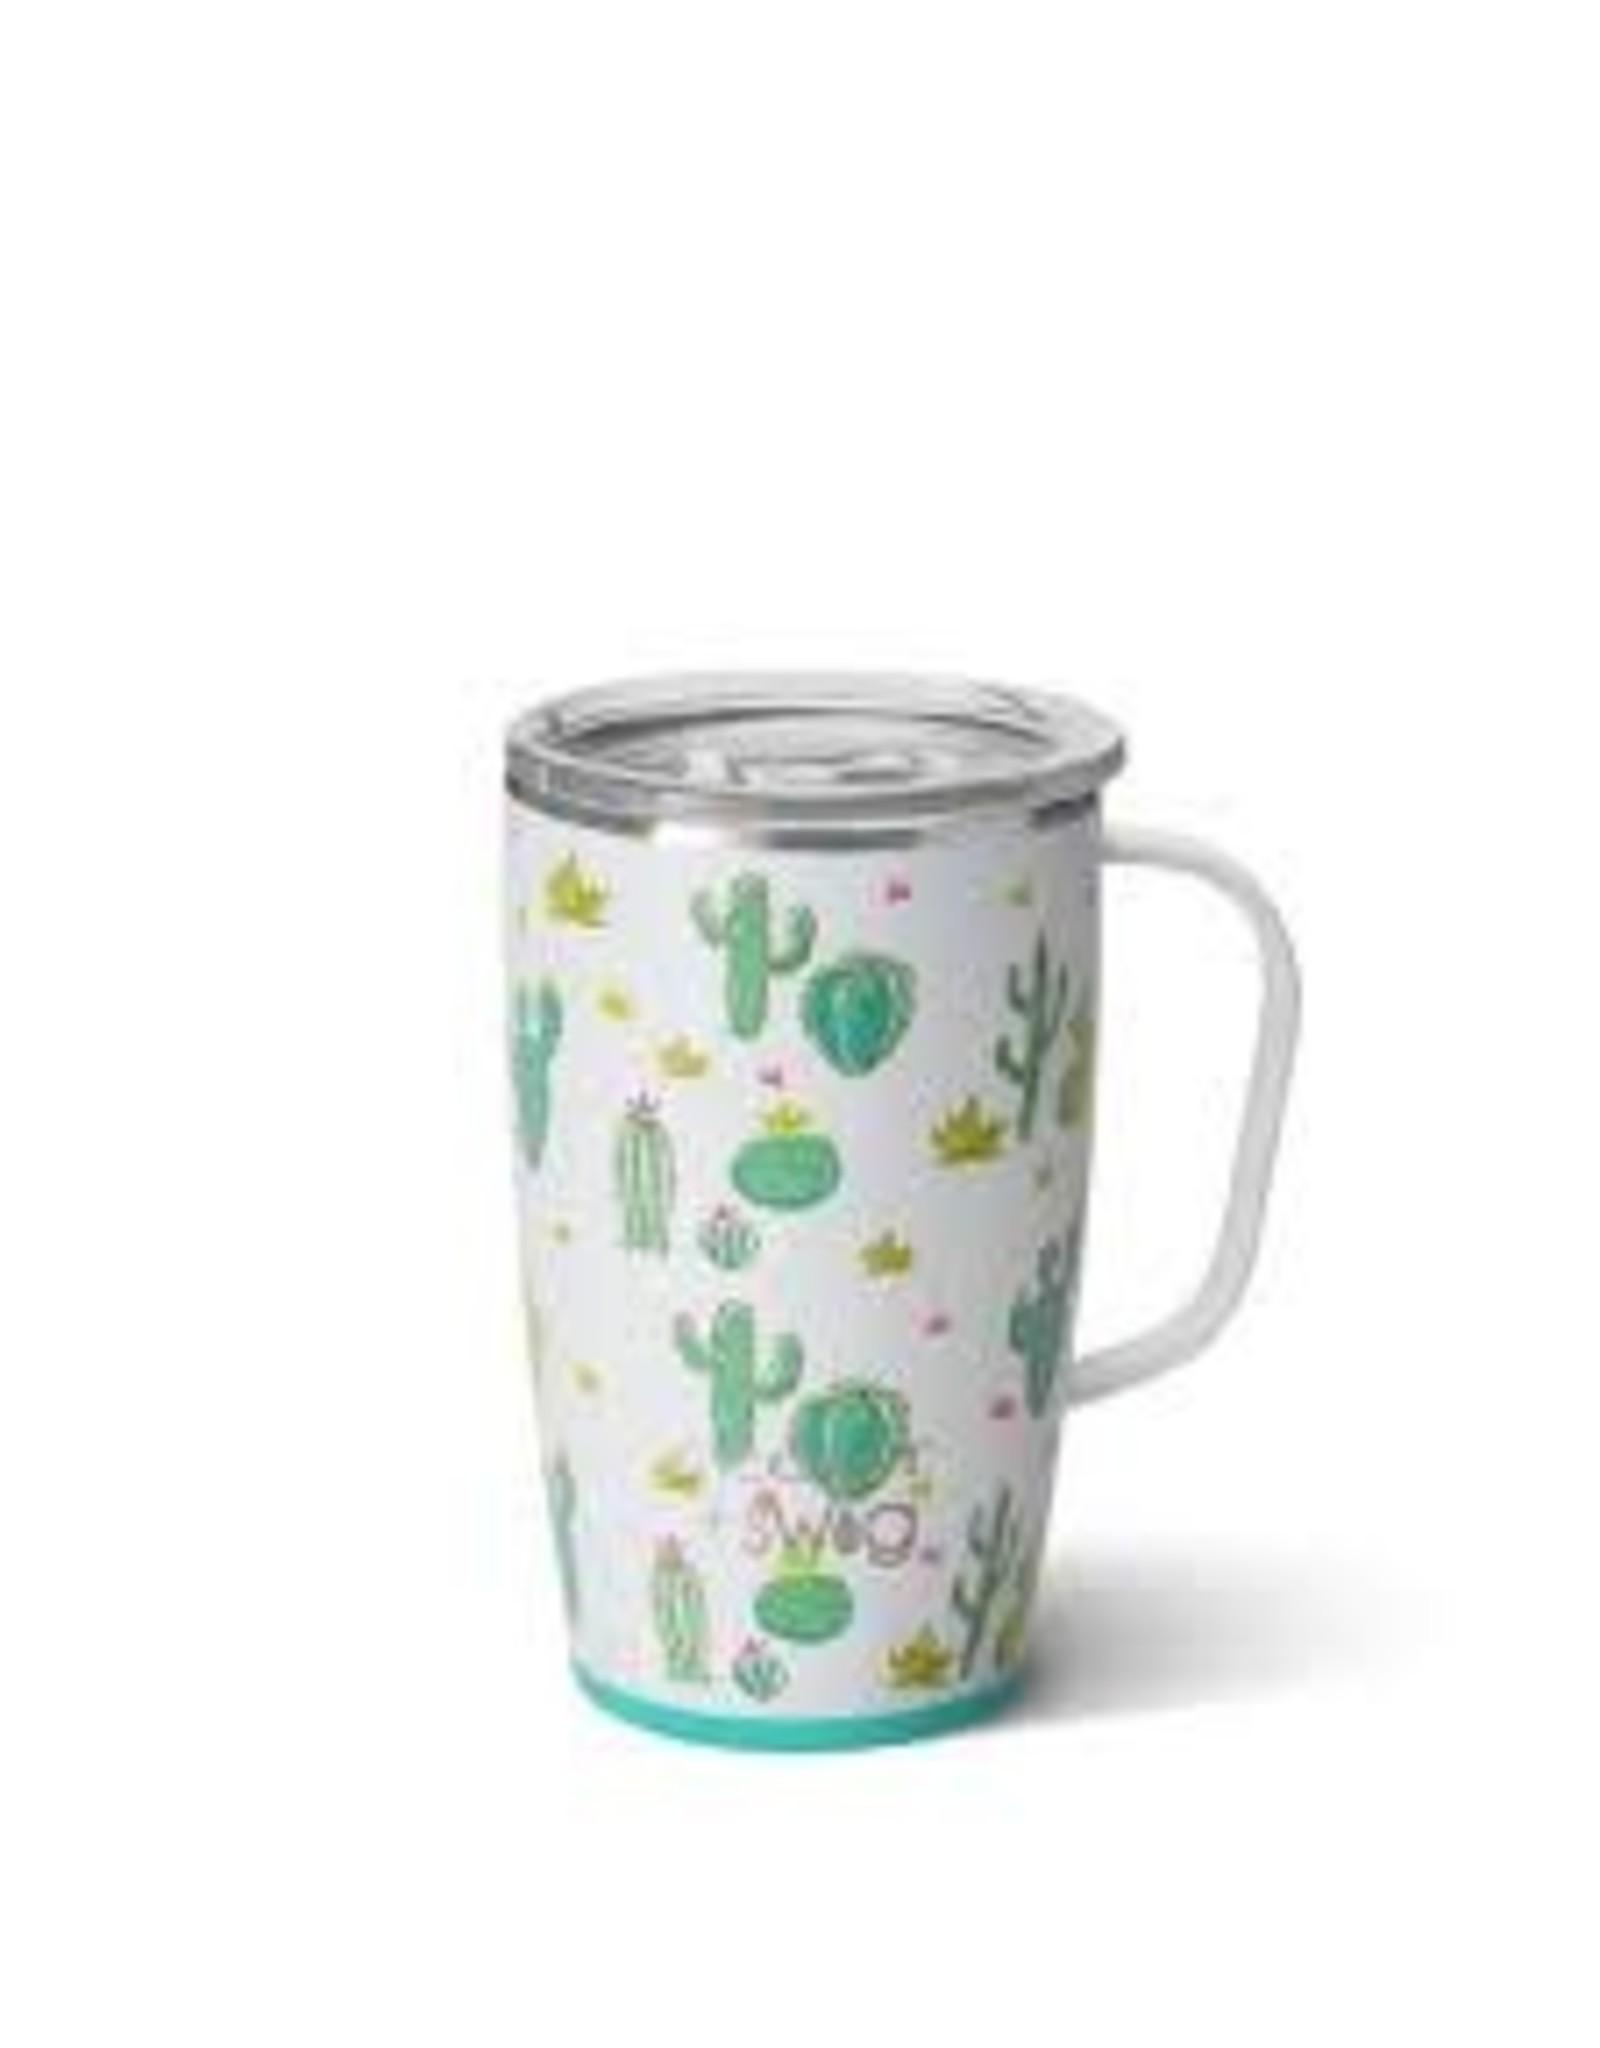 Cactus Makes Perfect Mug